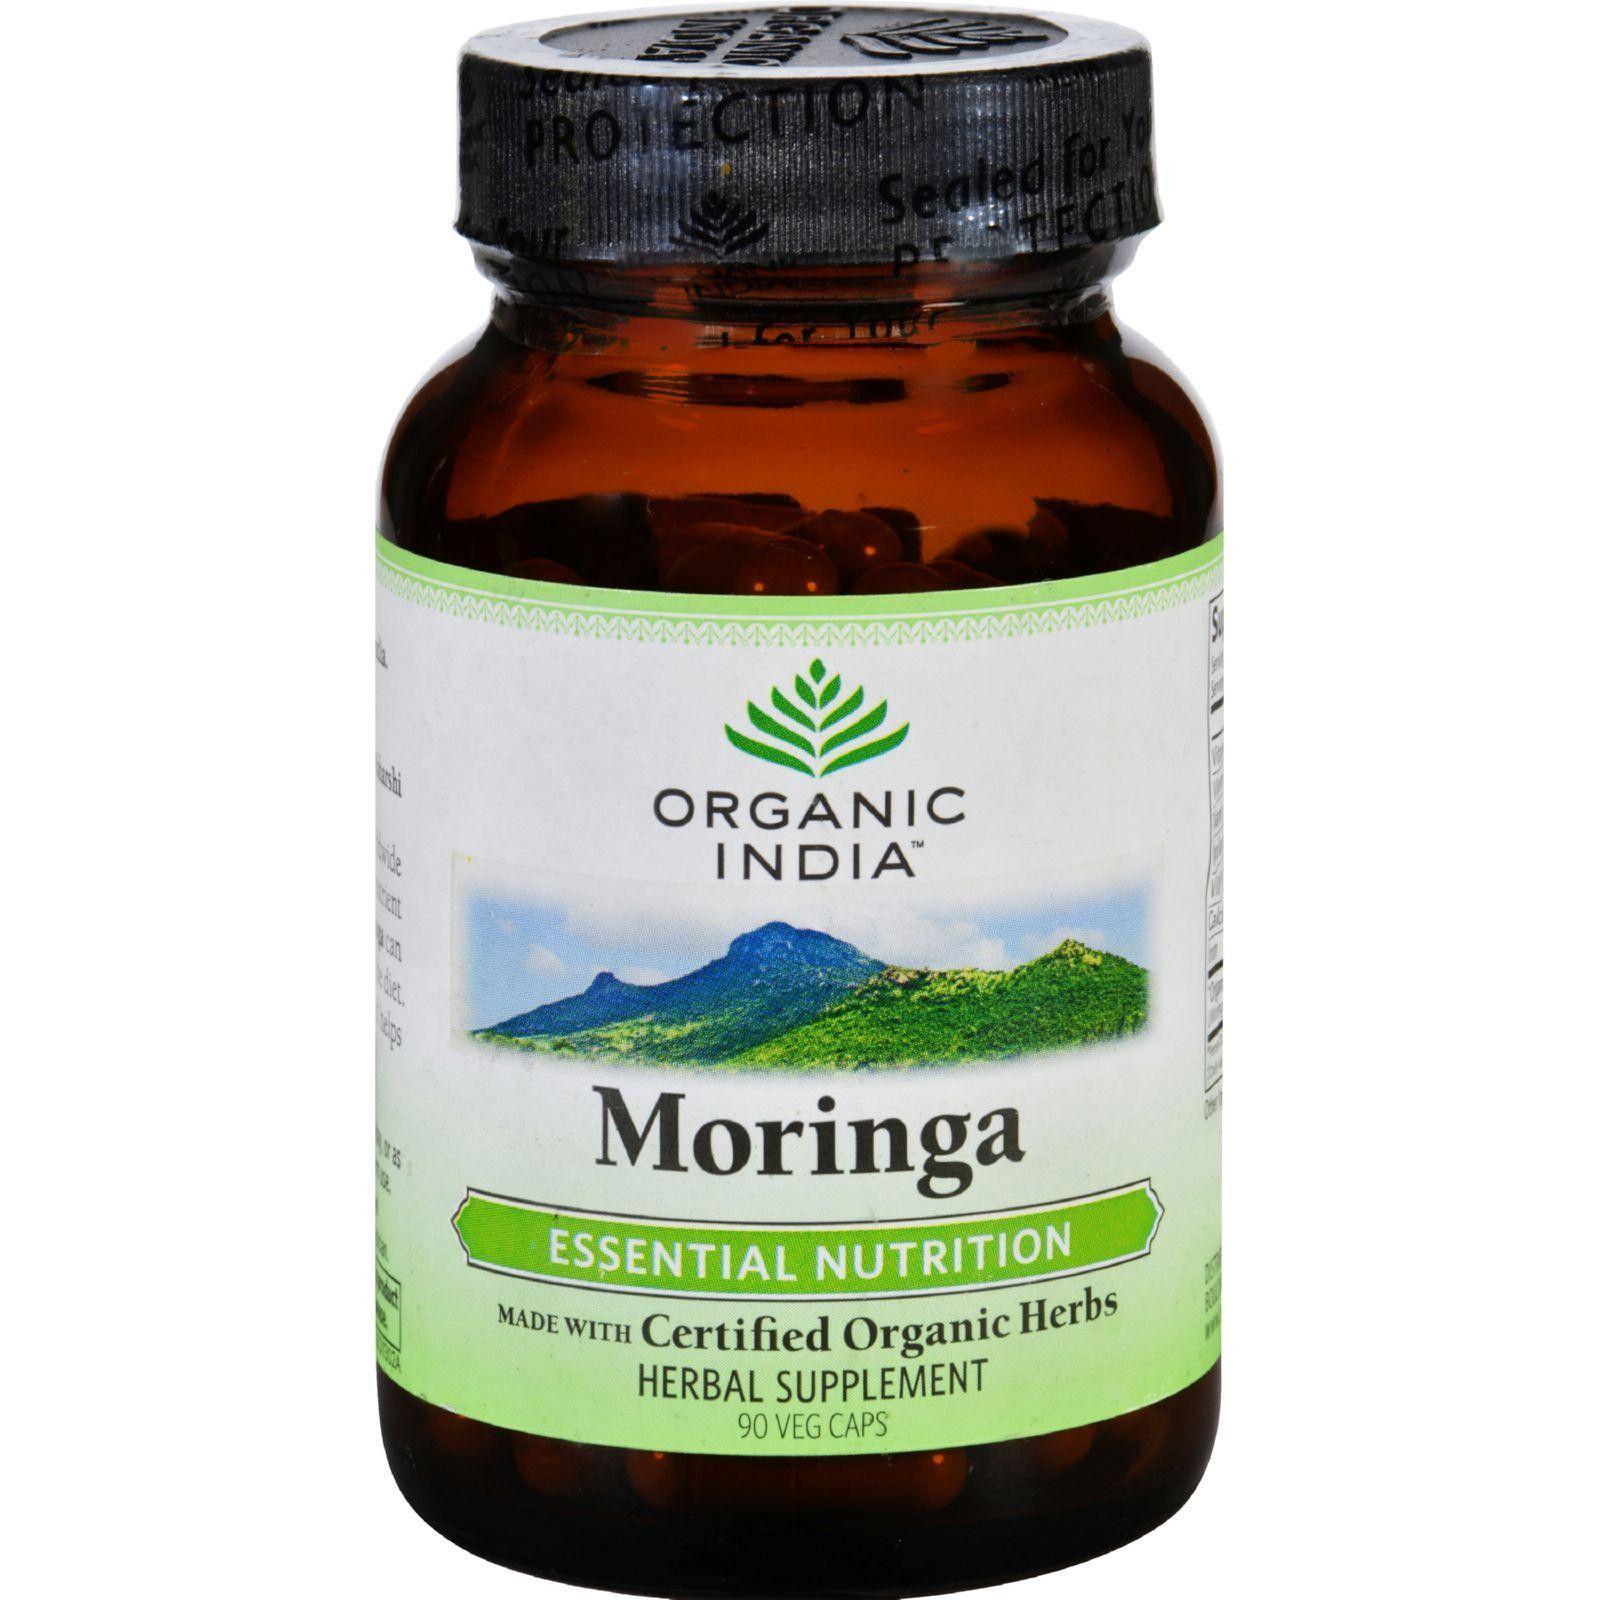 Organic India Moringa 90 Vcaps Remedios caseros, Salud